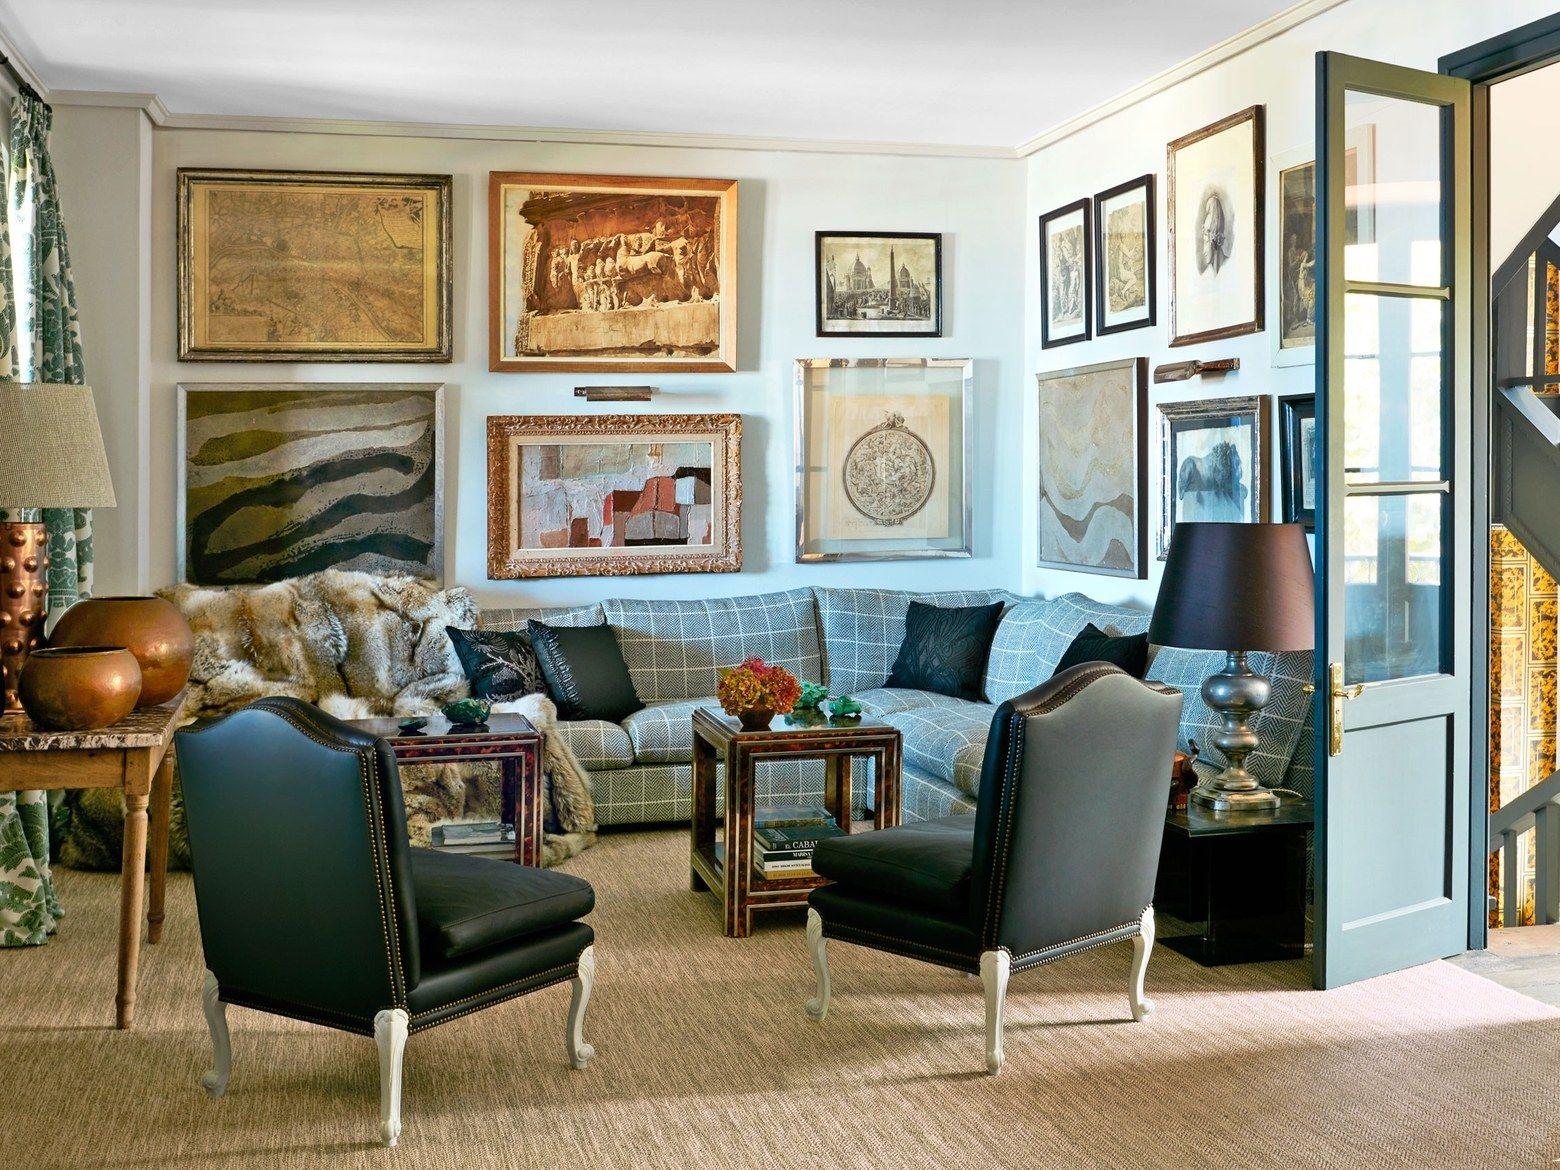 Home interior design maps home decor ideas  mixing antique furniture and contemporary decor